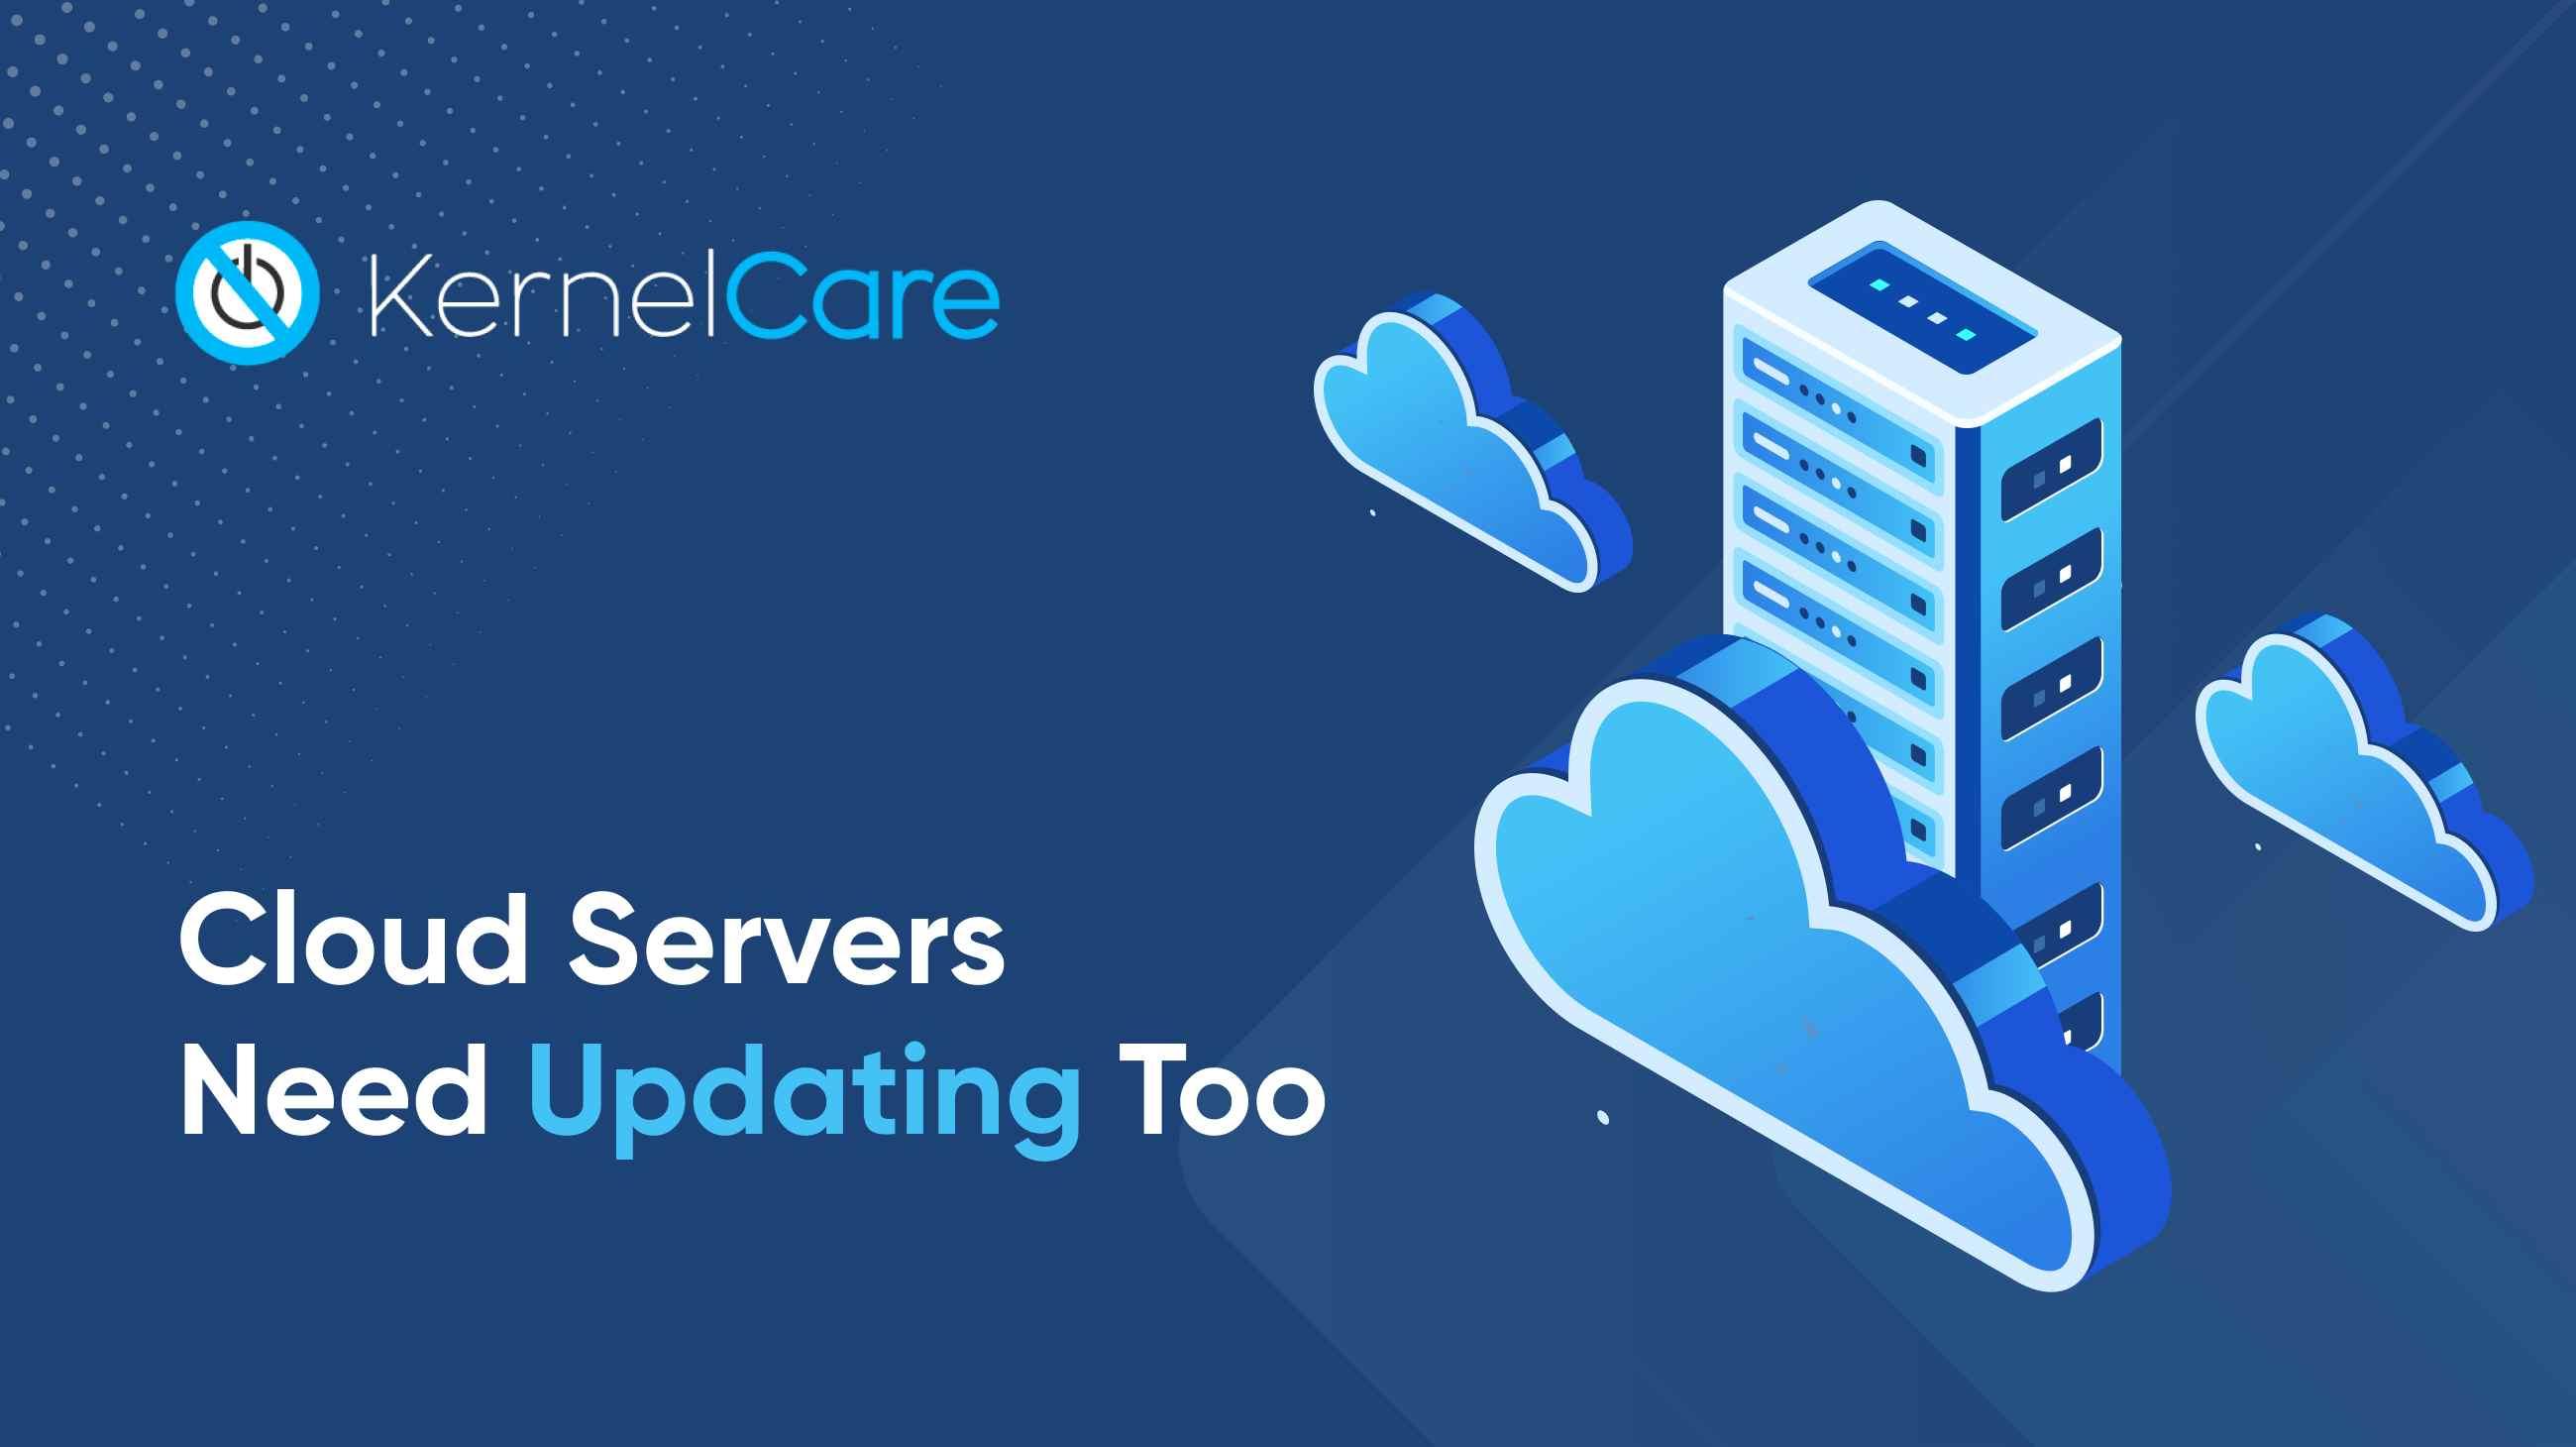 Cloud Servers Need Updating Too